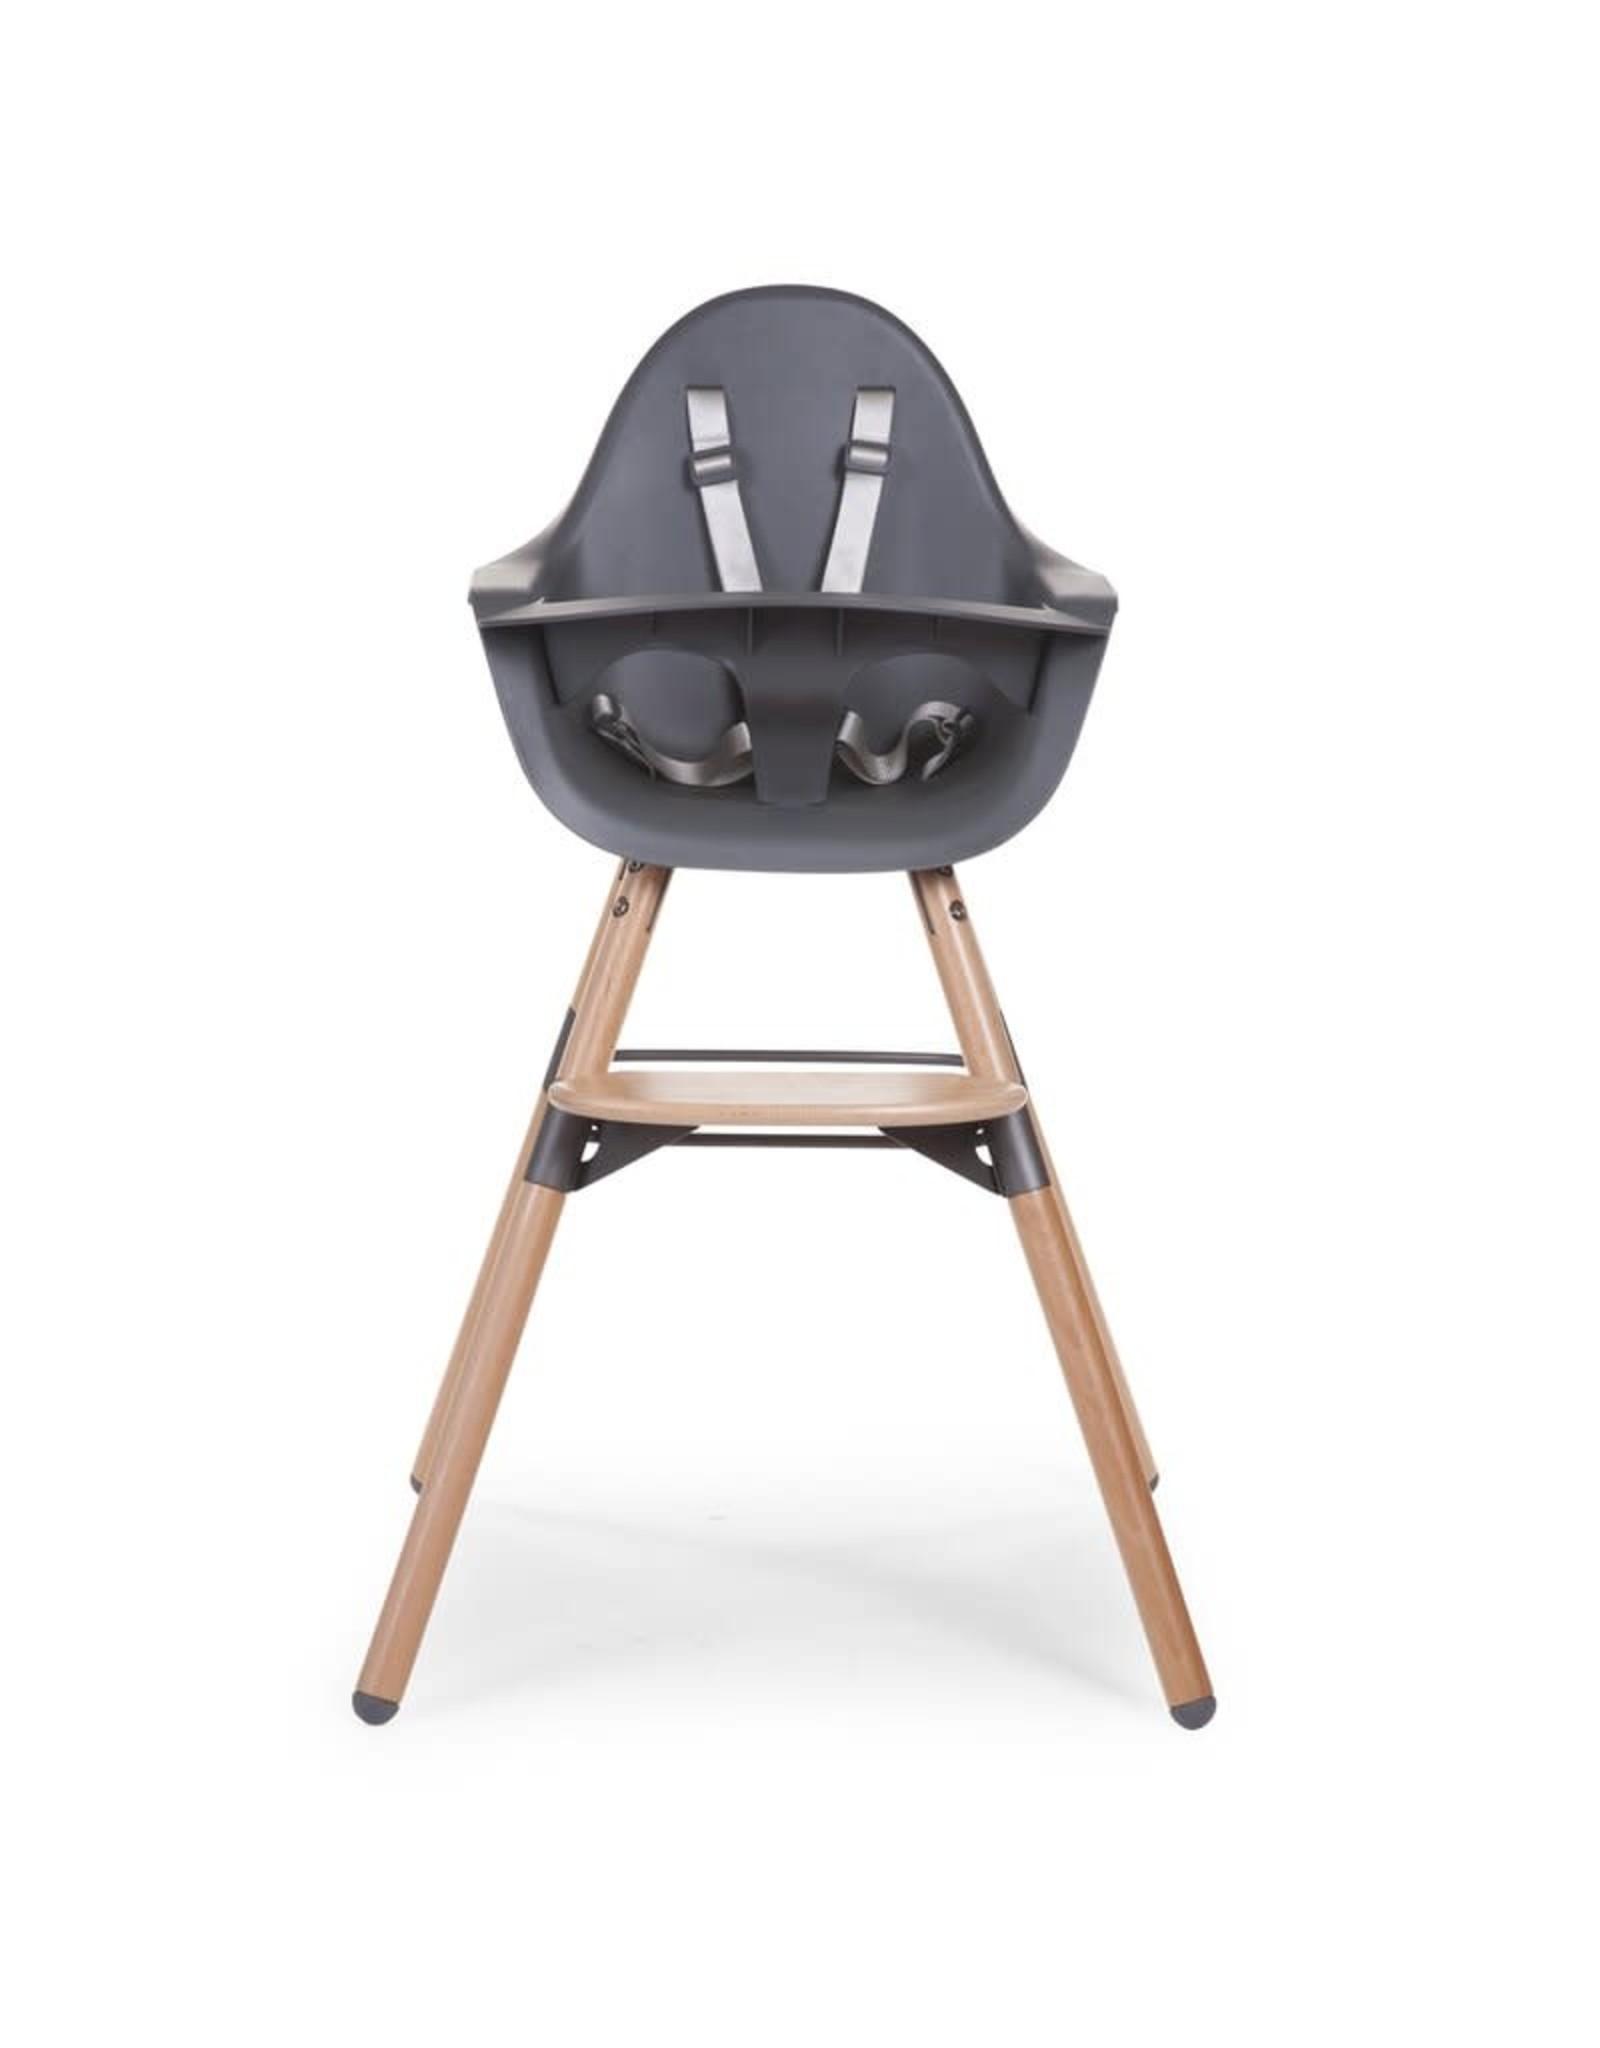 Childhome Childhome Evolu 2 Kinderstoel - Verstelbaar In Hoogte (50-75 Cm/*90 Cm) - Naturel Antraciet